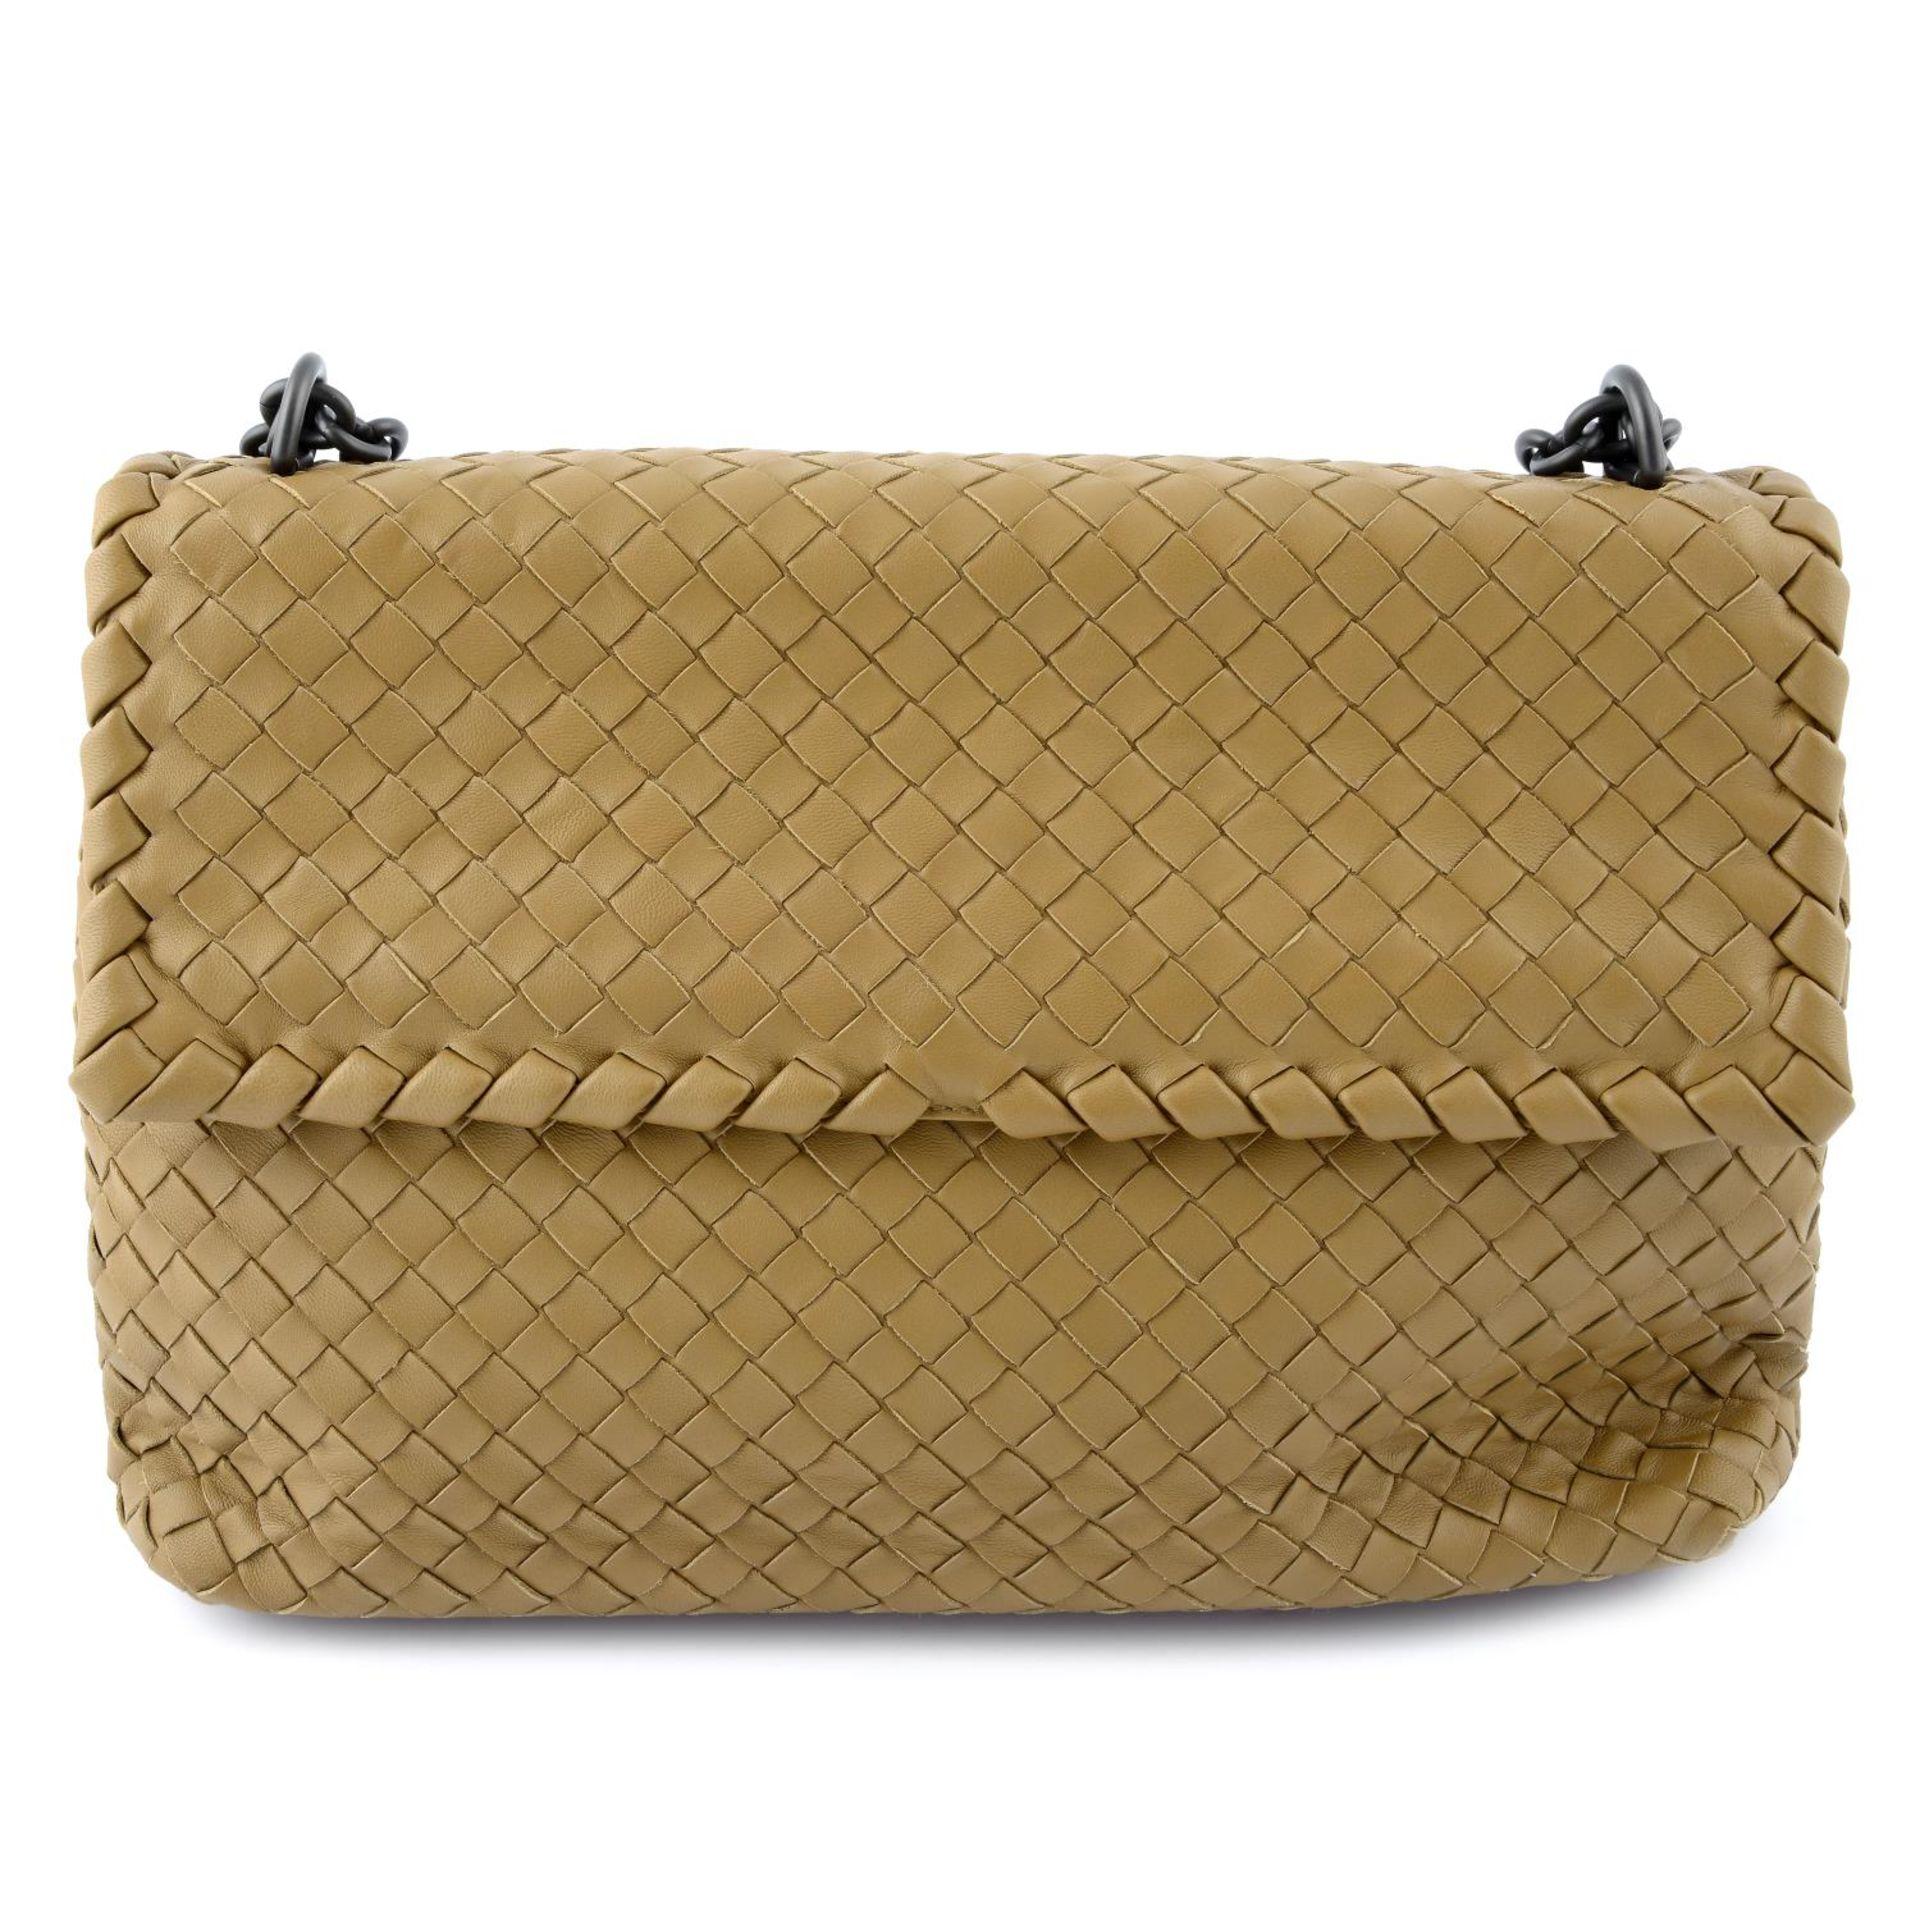 BOTTEGA VENETA - a fold over Intrecciato handbag.